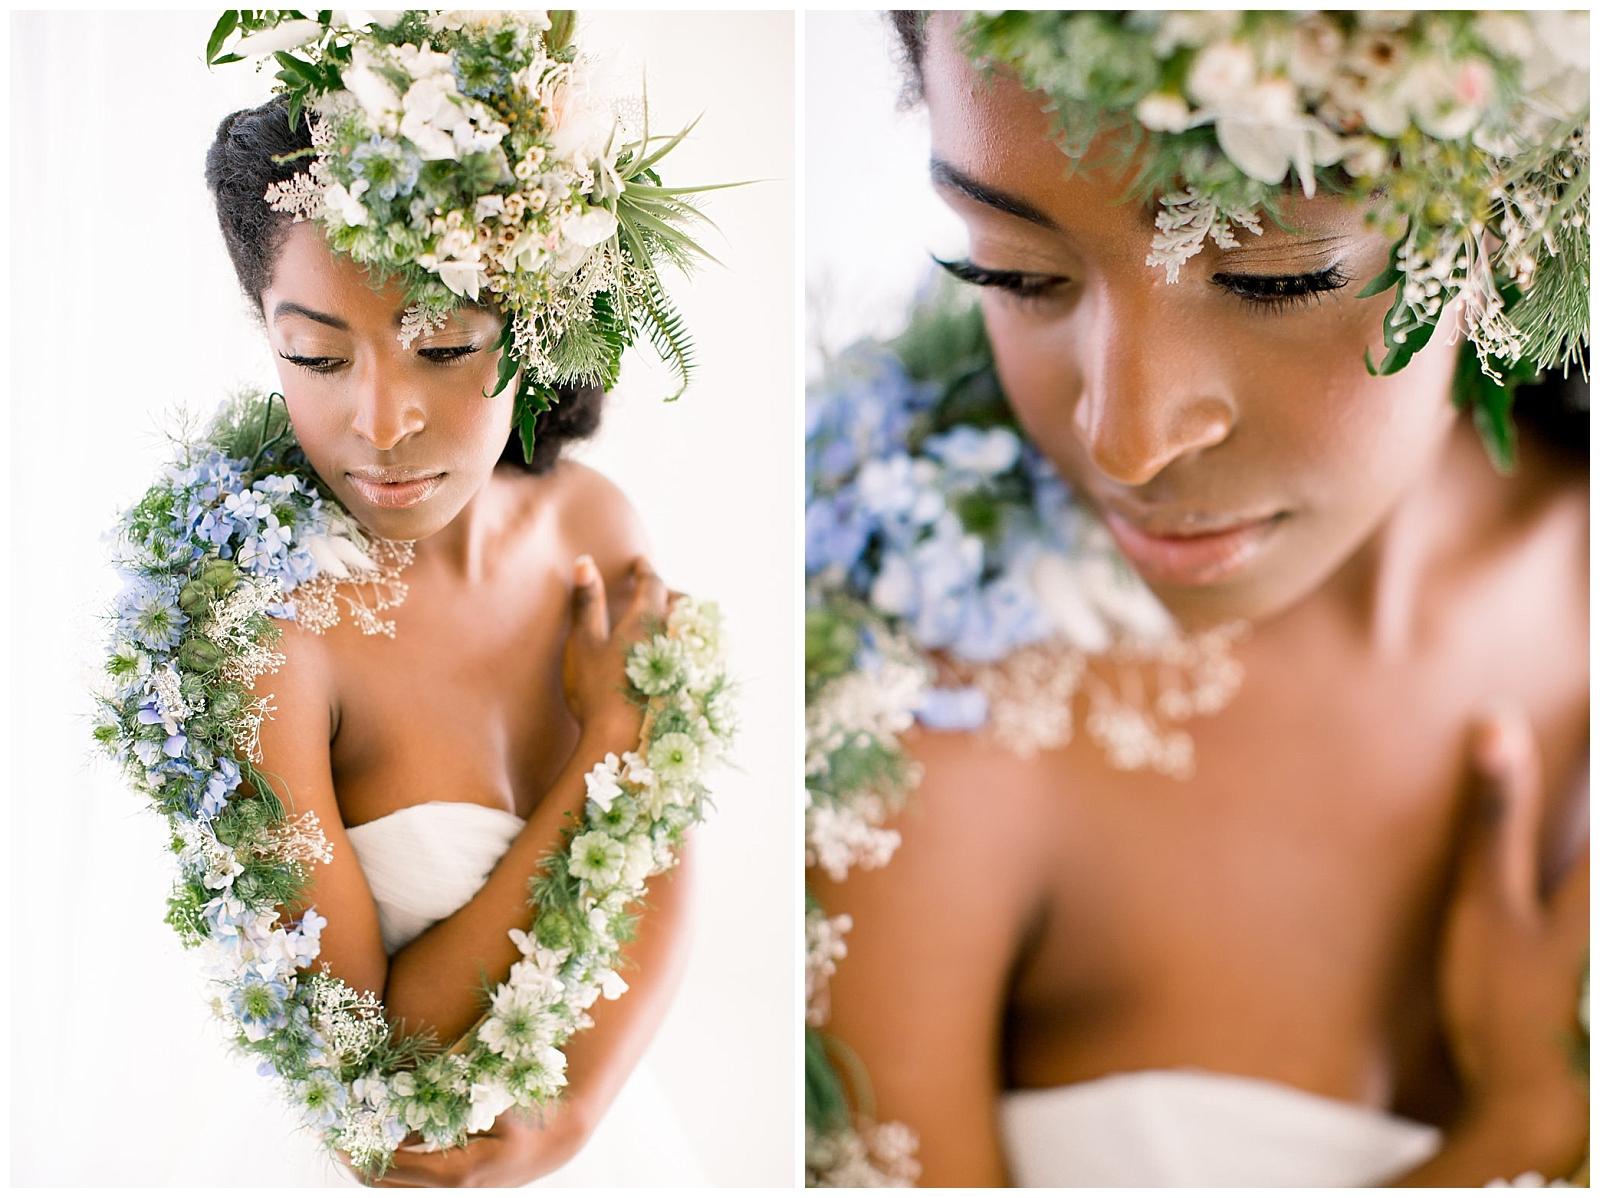 Living-Accessories-styled-shoot-de-joy-photography-epiphany-boutique-floral-inspo.jpg